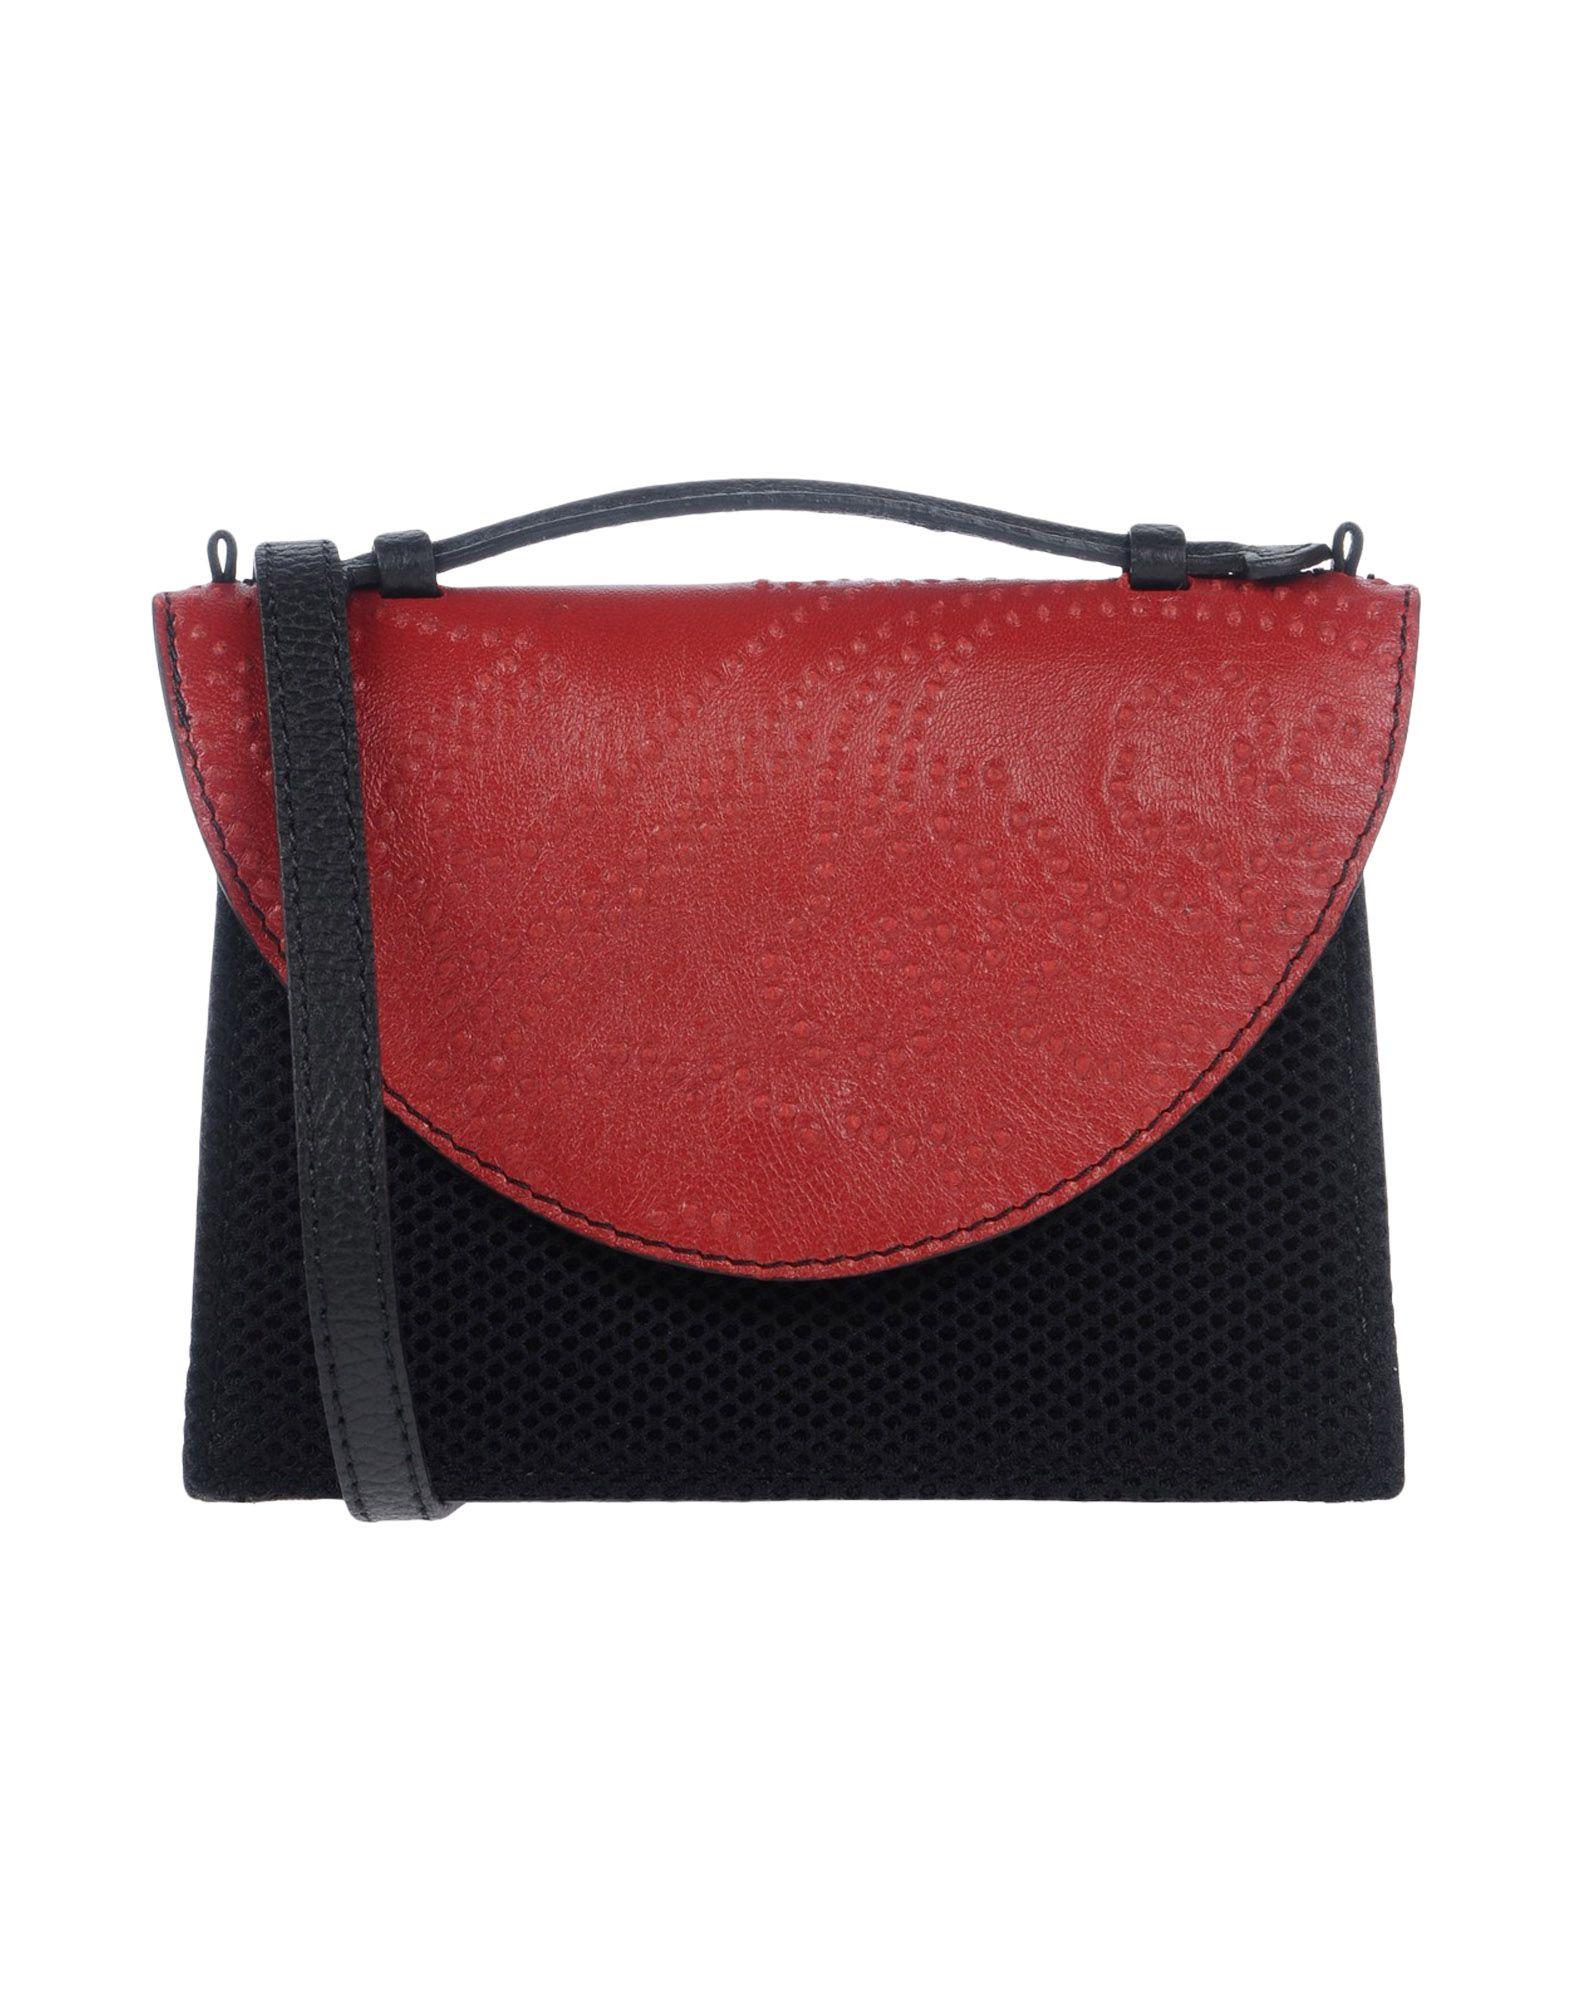 IMEMOI Handbag in Red